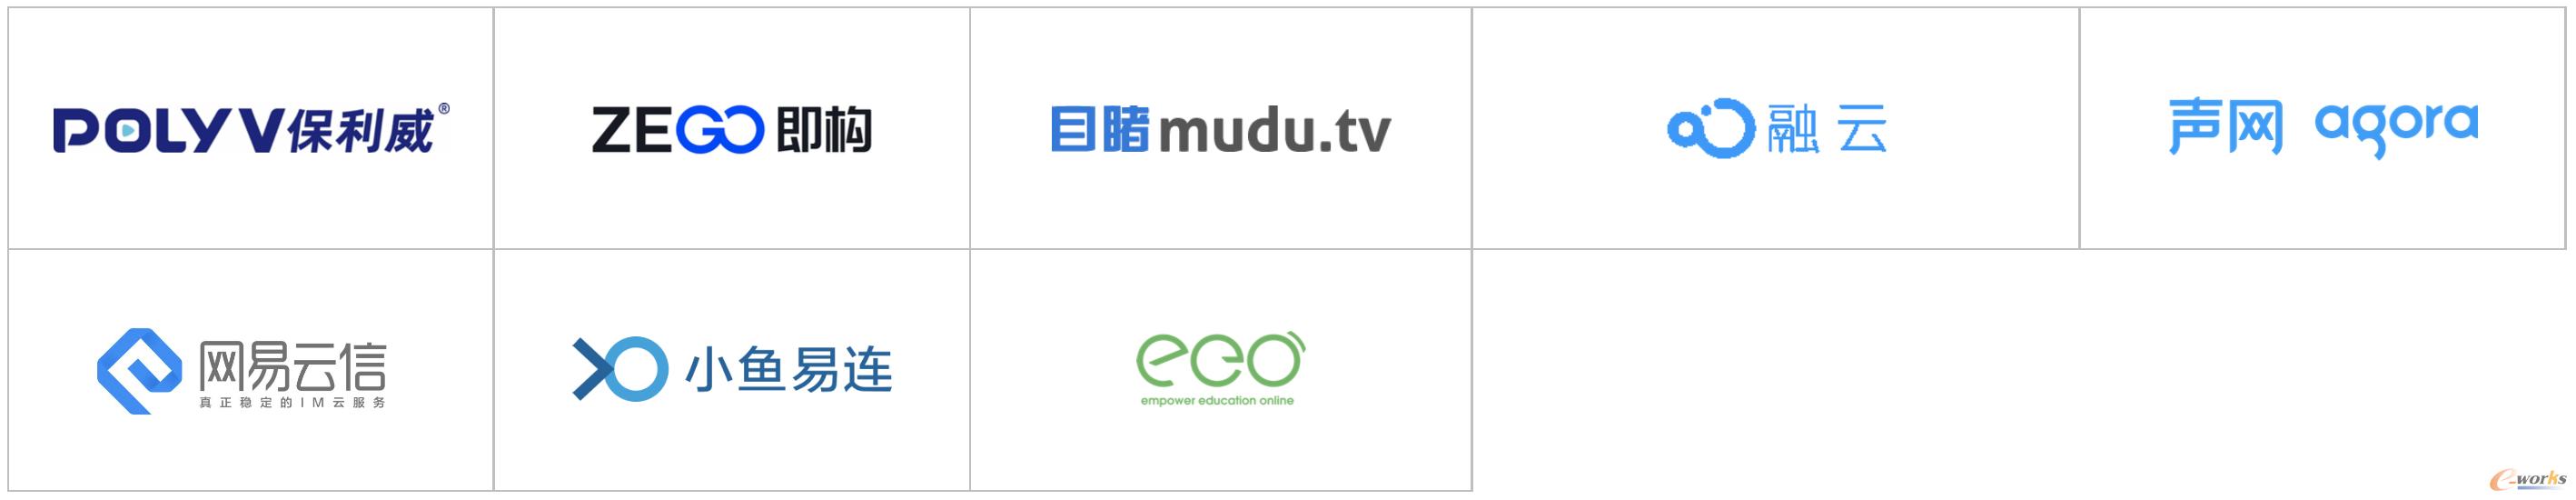 http://www.e-works.net.cn/News/articleimage/202012/132512895783606600_new.png